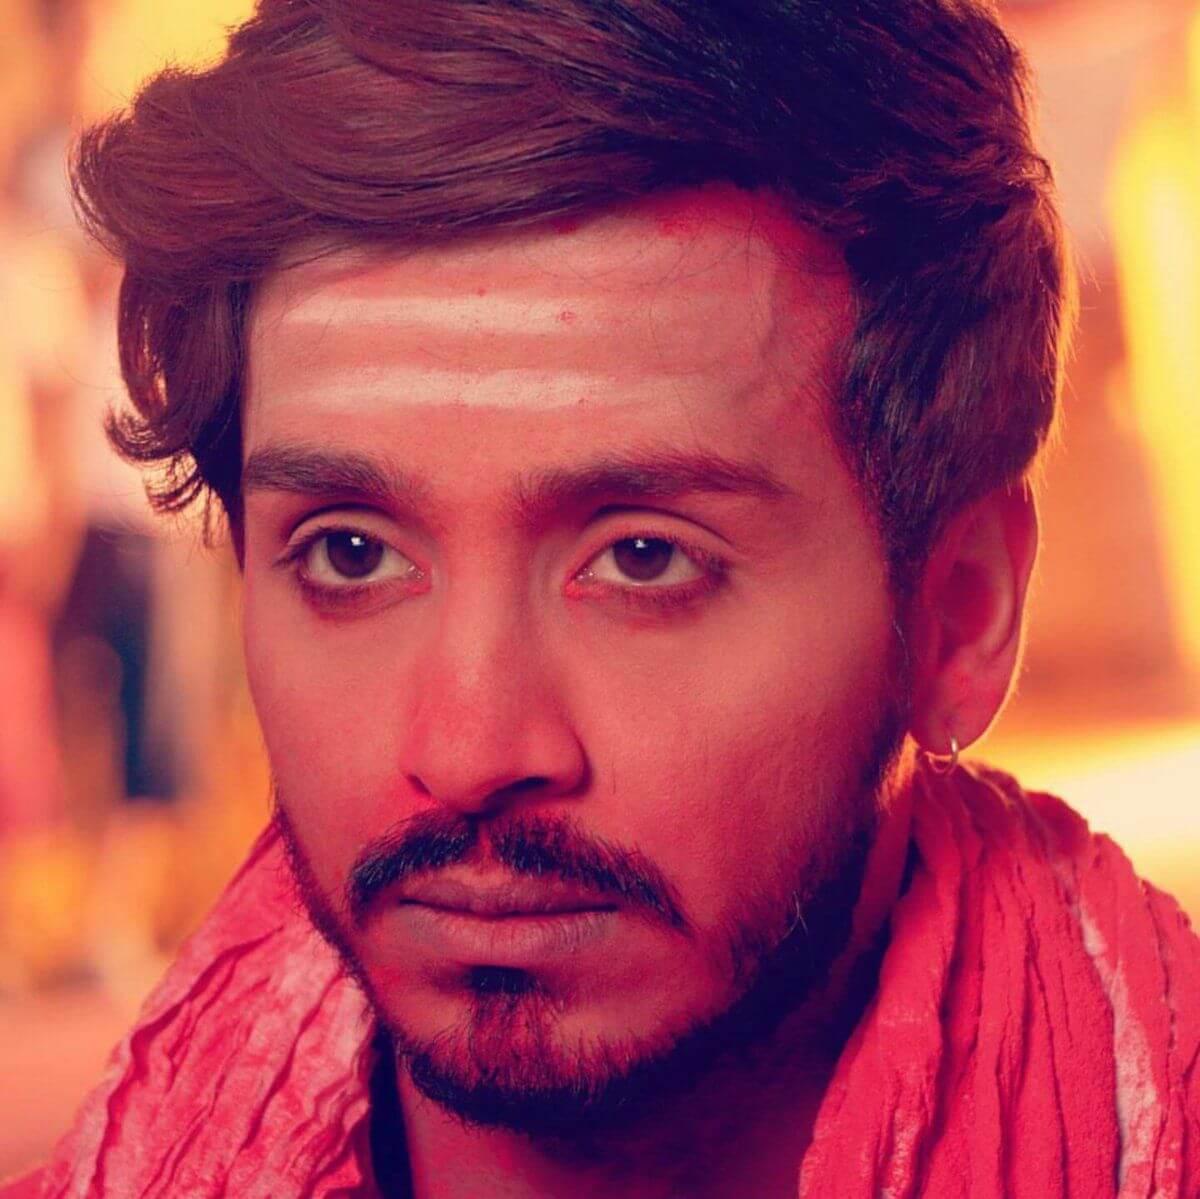 Param Singh Age, Biography, Girlfriend, Height, Net Worth, Images(photos), Wiki, Birthday, Instagram, Twitter, Imdb, Facebook, Youtube, Education (20)